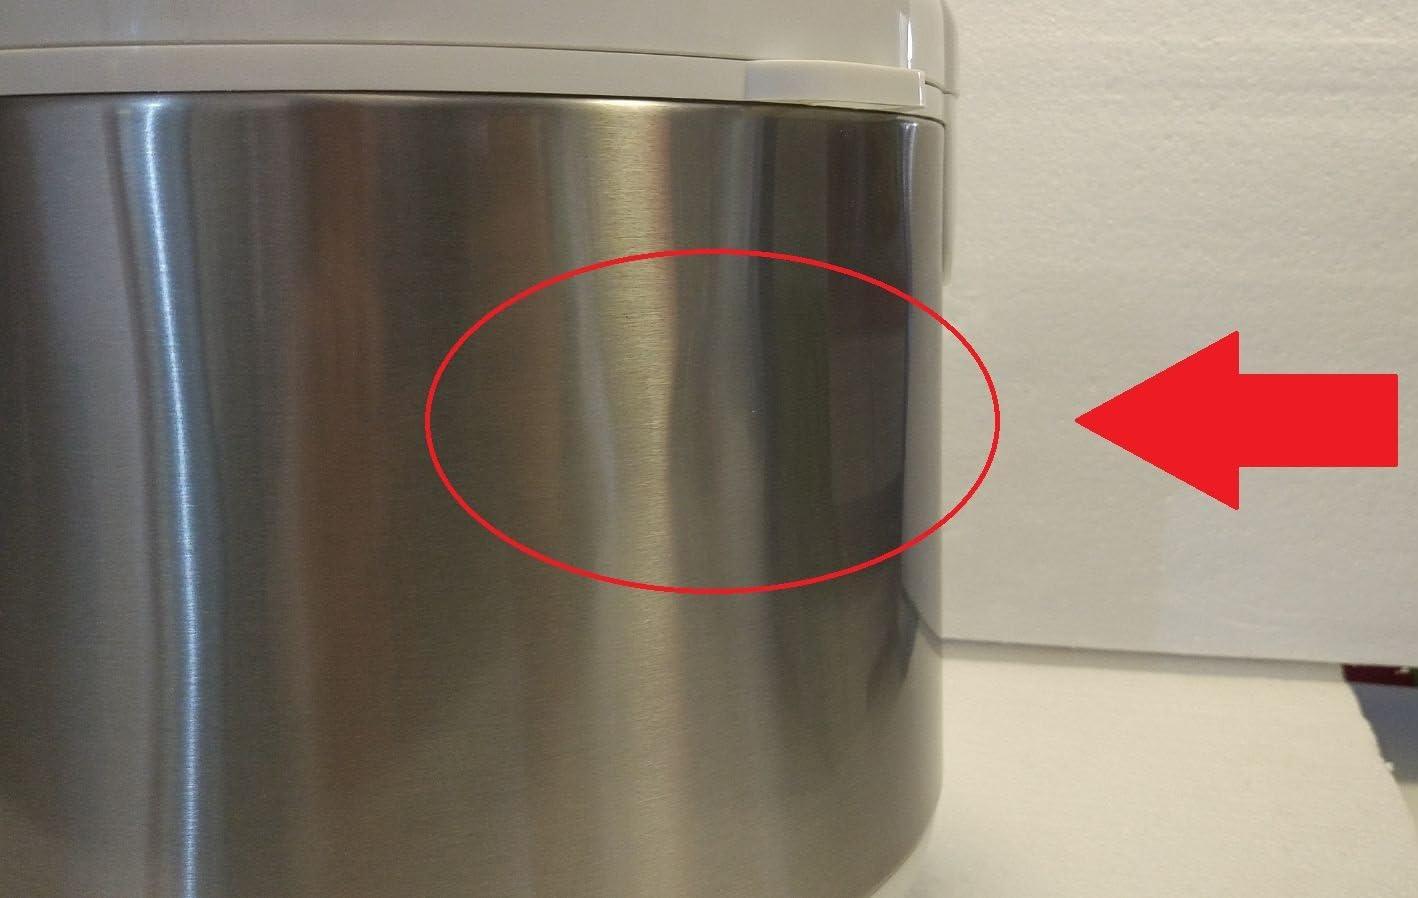 Top SHOP masterful Robot de cocina 5 l 700 W 8 Menu preconfigurati + Cookbook Ref. 73: Amazon.es: Hogar